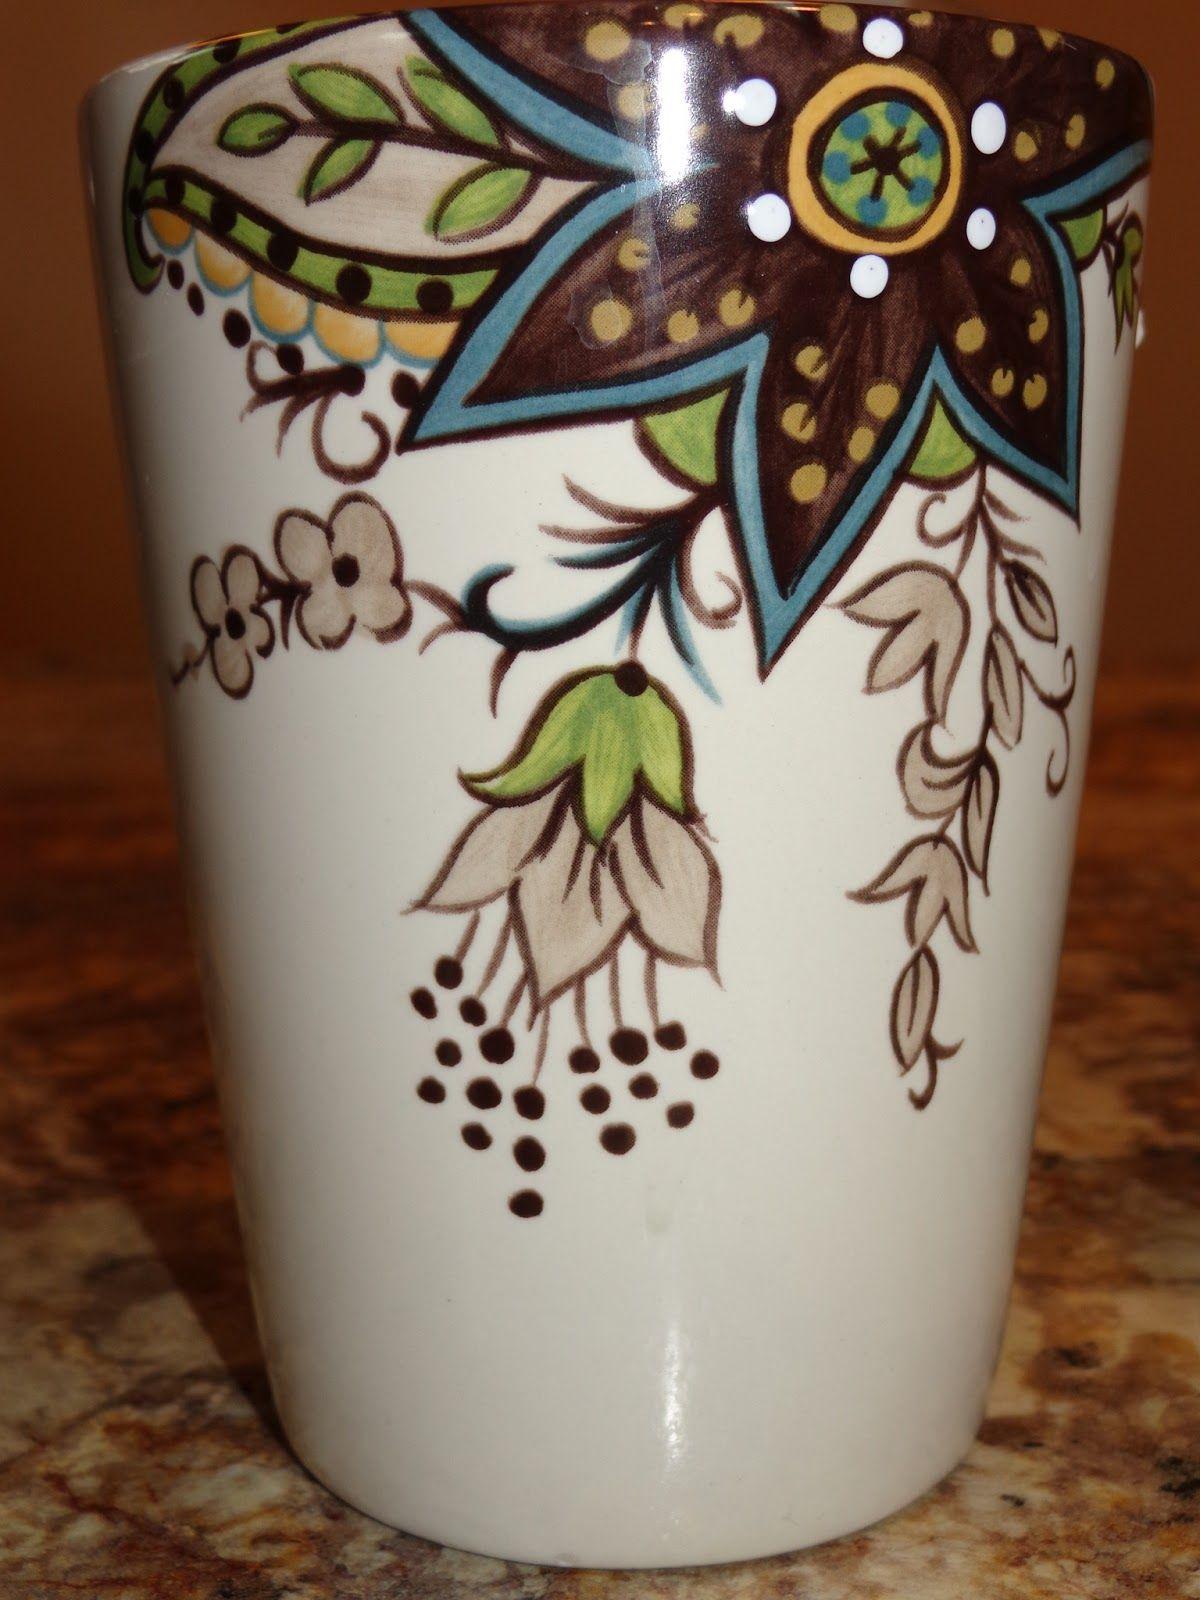 Delightful Coffee/ Tea Mug Tabletop Gallery Mug, Angela Motheru0027s Day Gift Giving Guide  Raising Chiodos